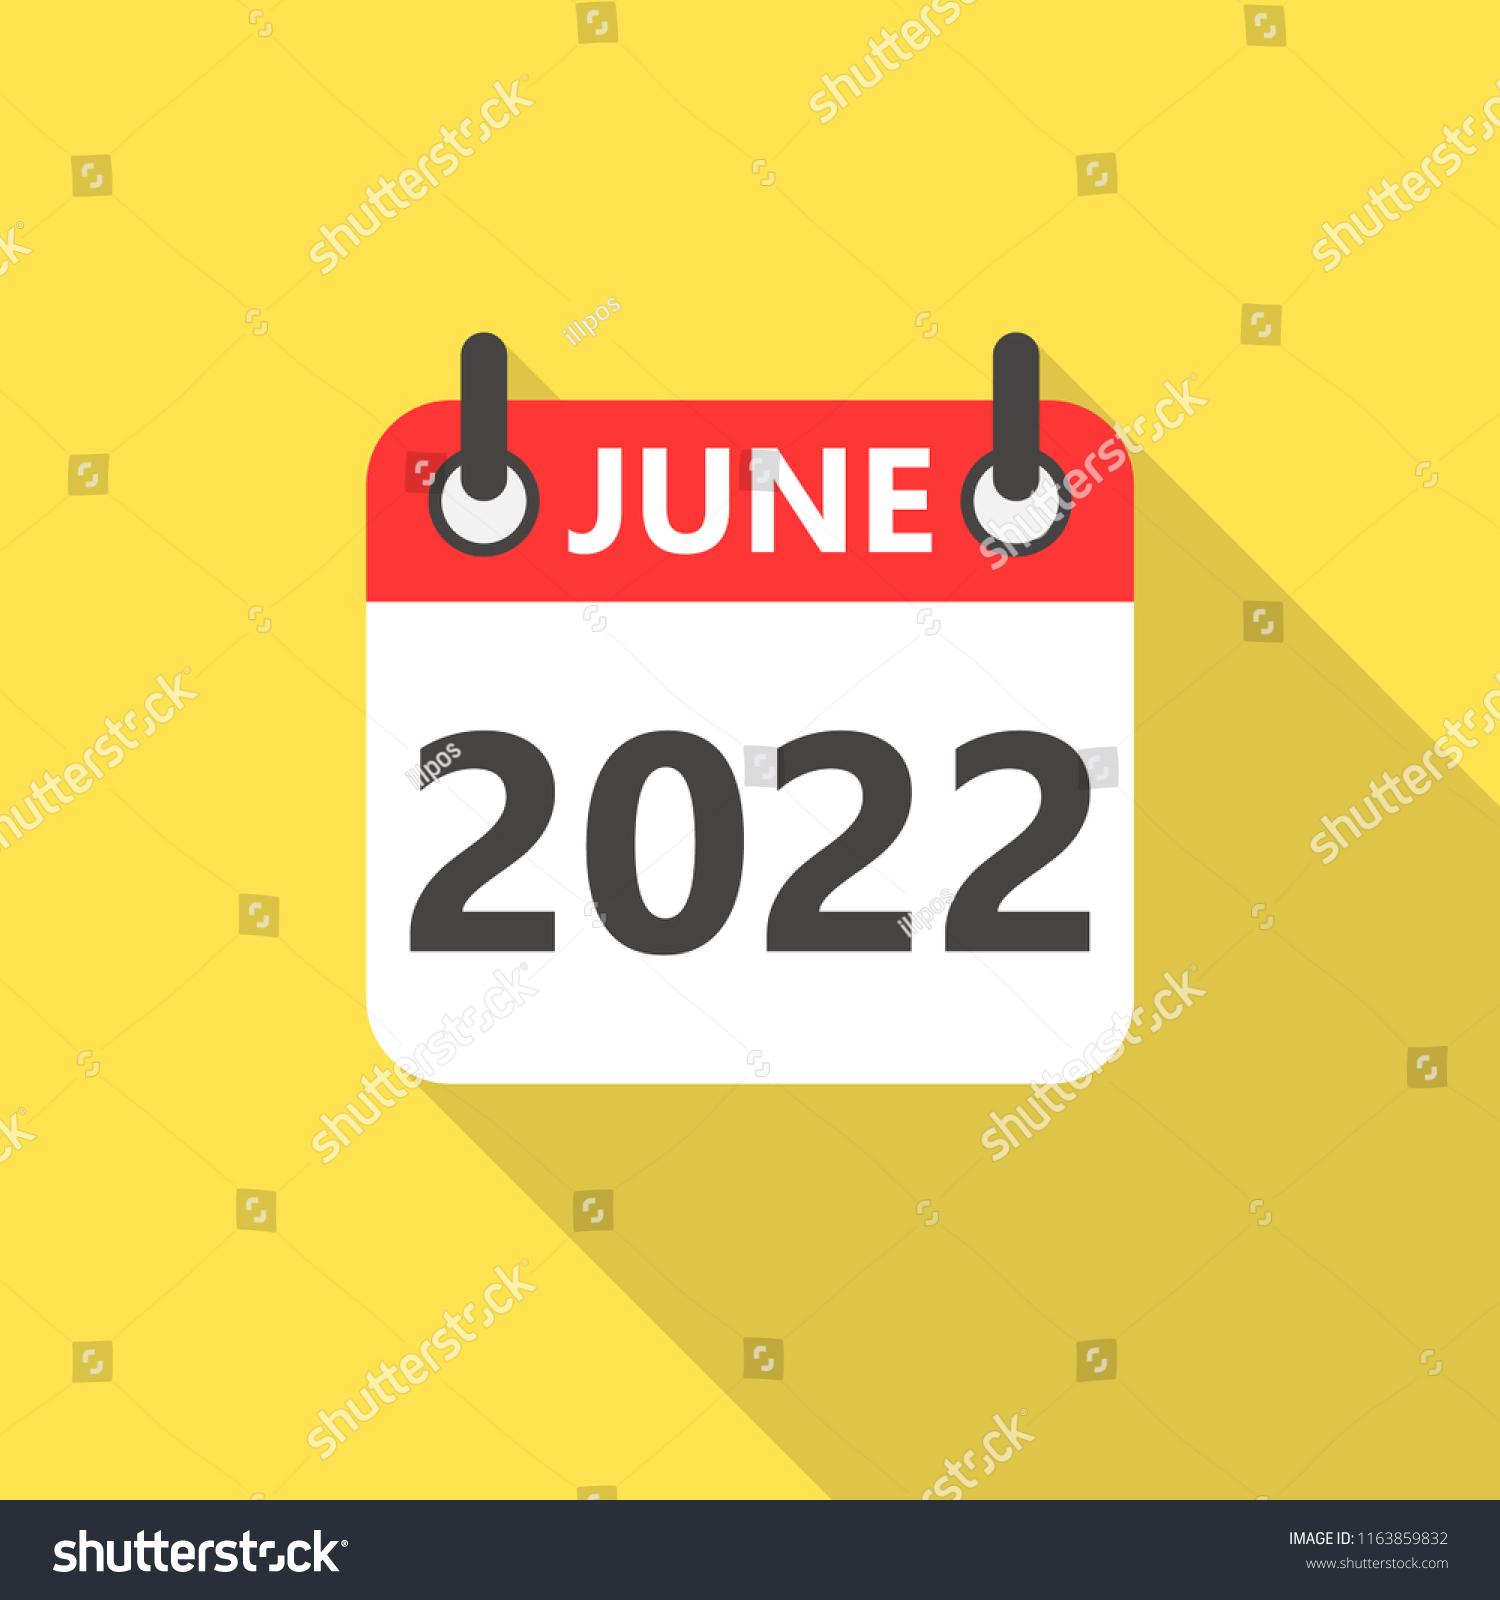 2022 June Calendar.June 2022 Calendar Flat Style Icon Stock Vector Royalty Free 1163859832